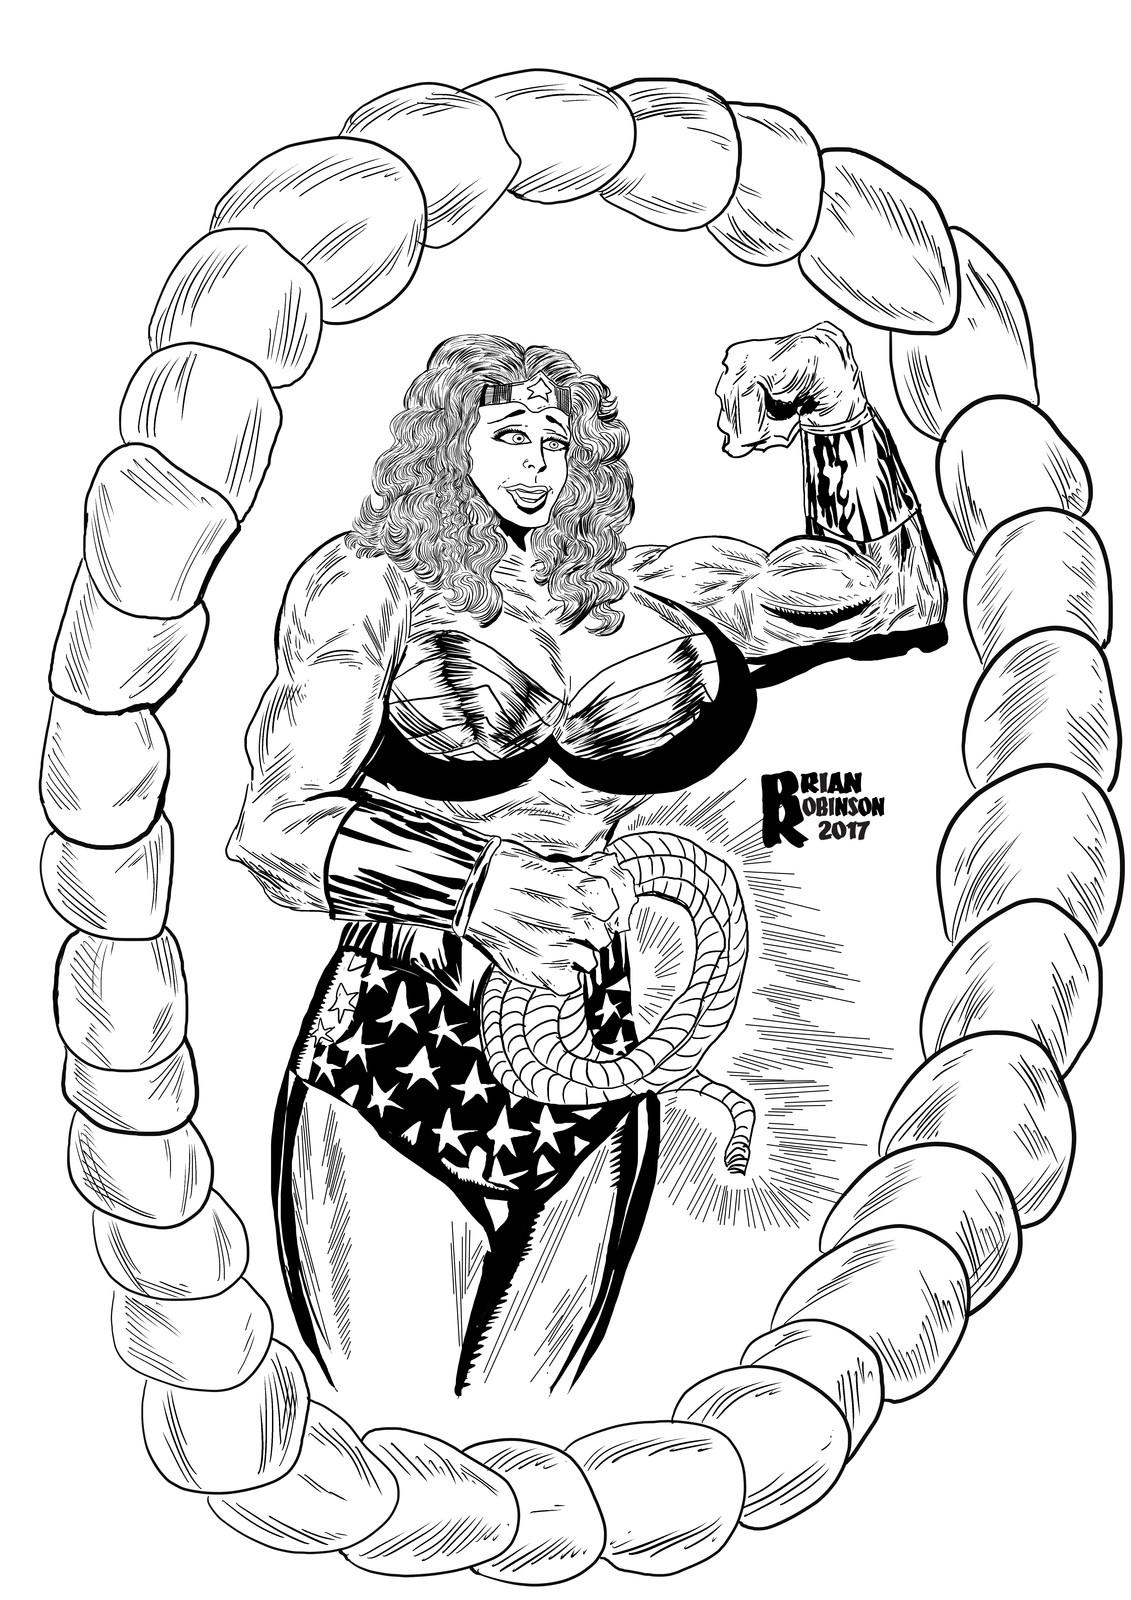 Wonder Woman drawing sketch by Brian Robinson